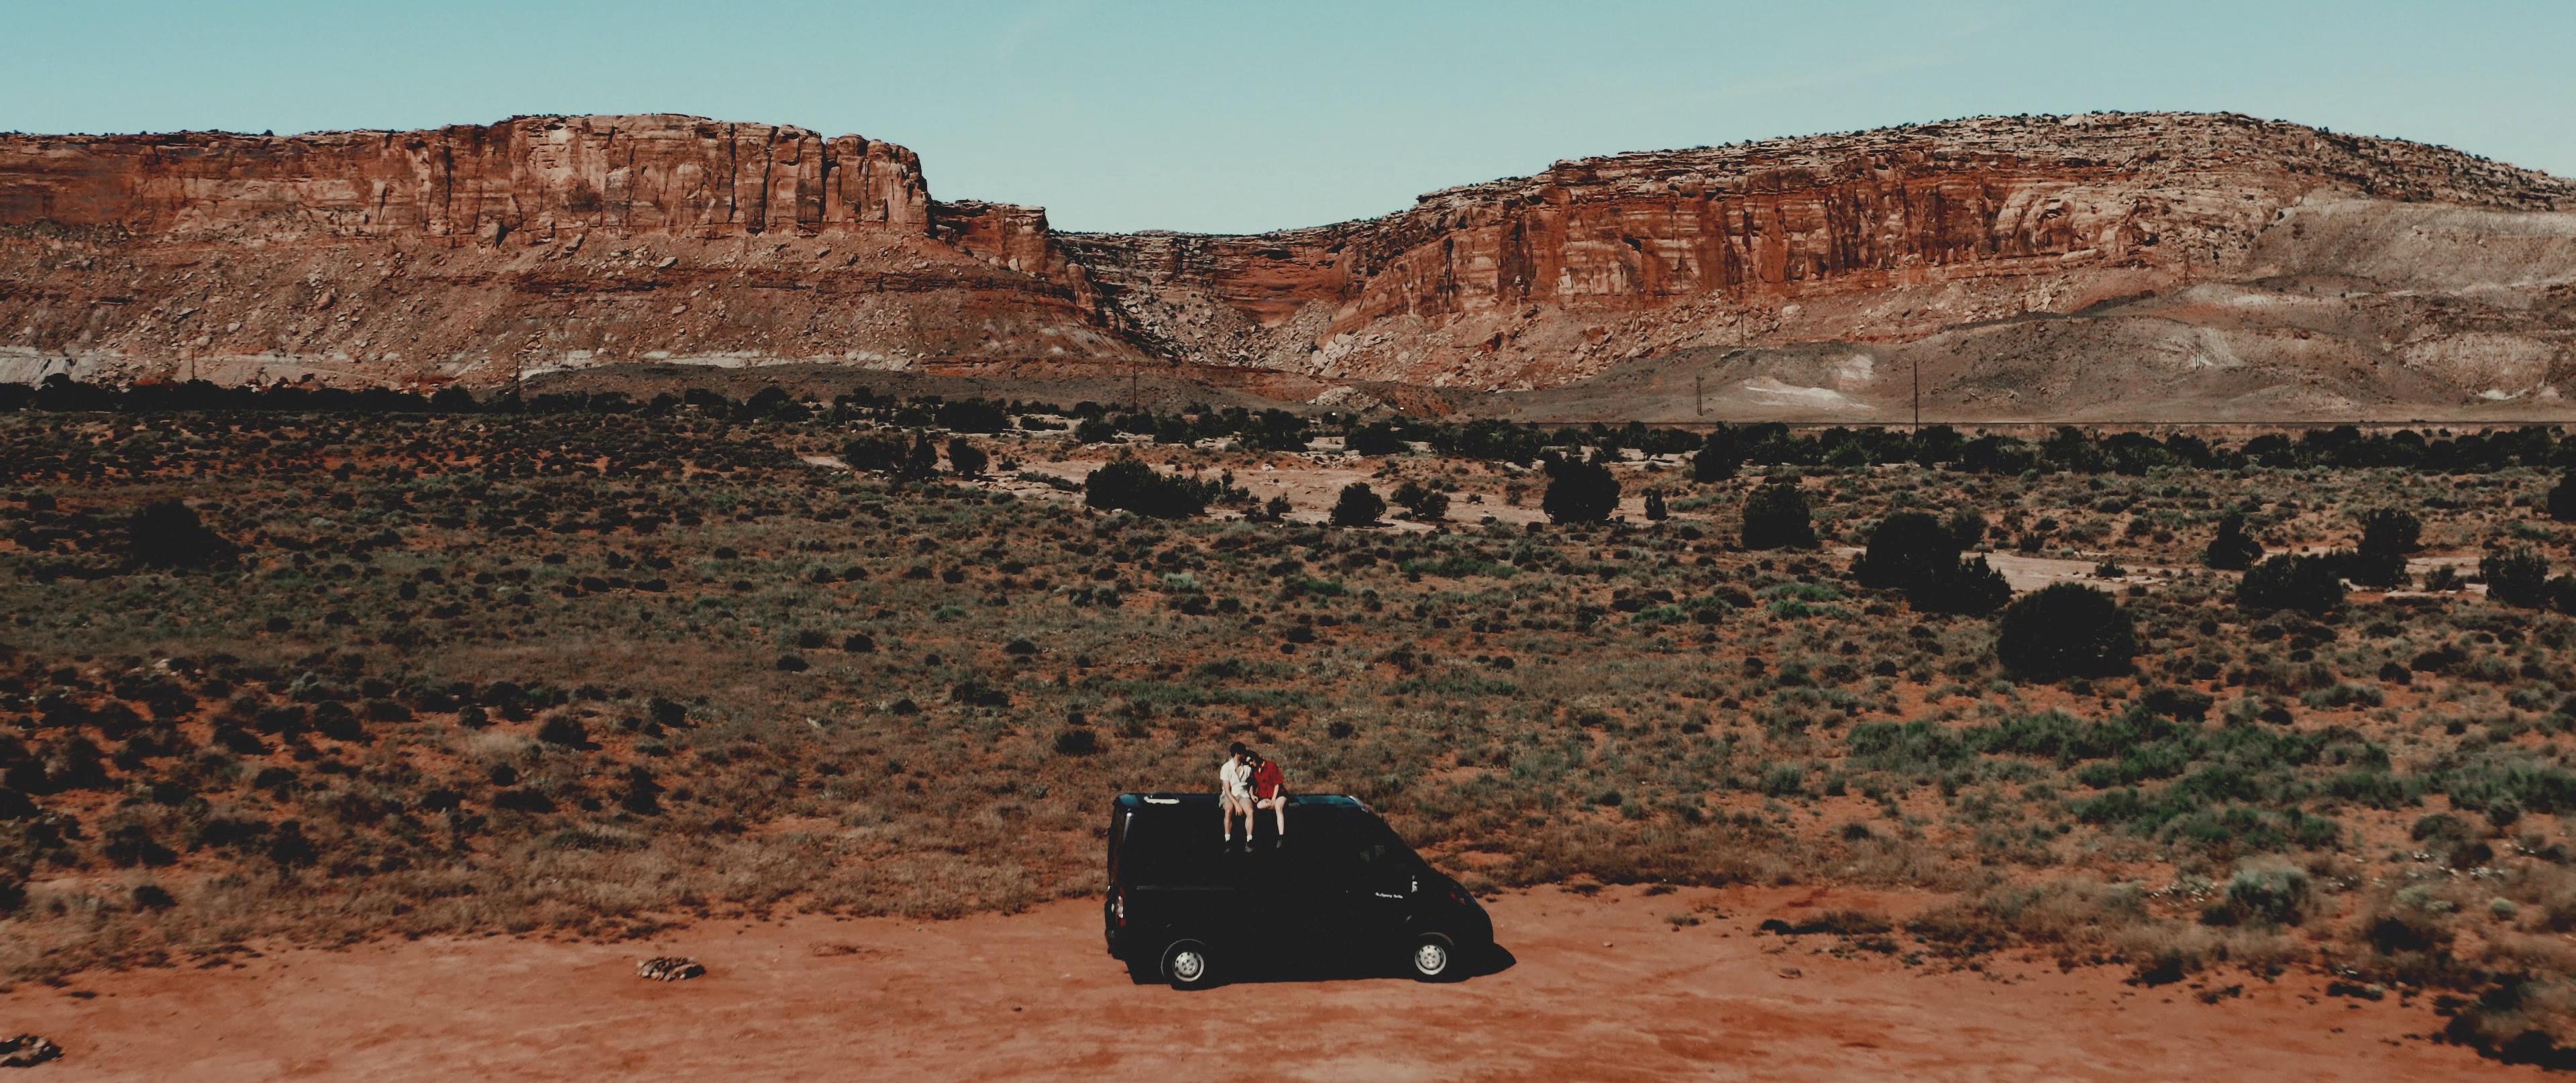 Liz + Sean | Moab, Utah | Dead Horse Point State Park